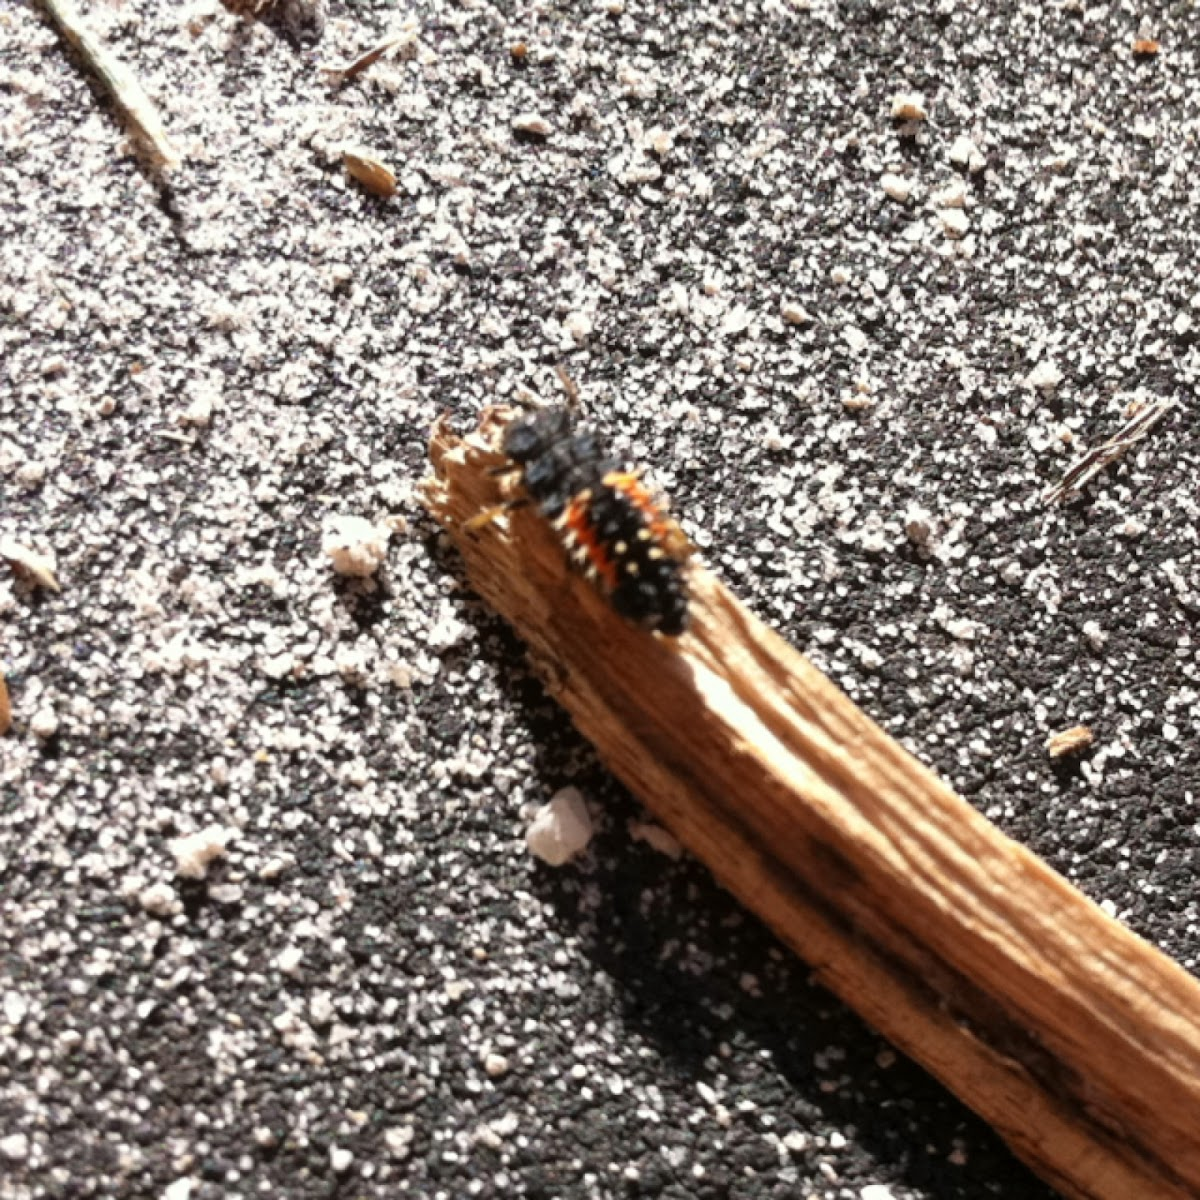 Multicolored Asian Lady Beetle Larva